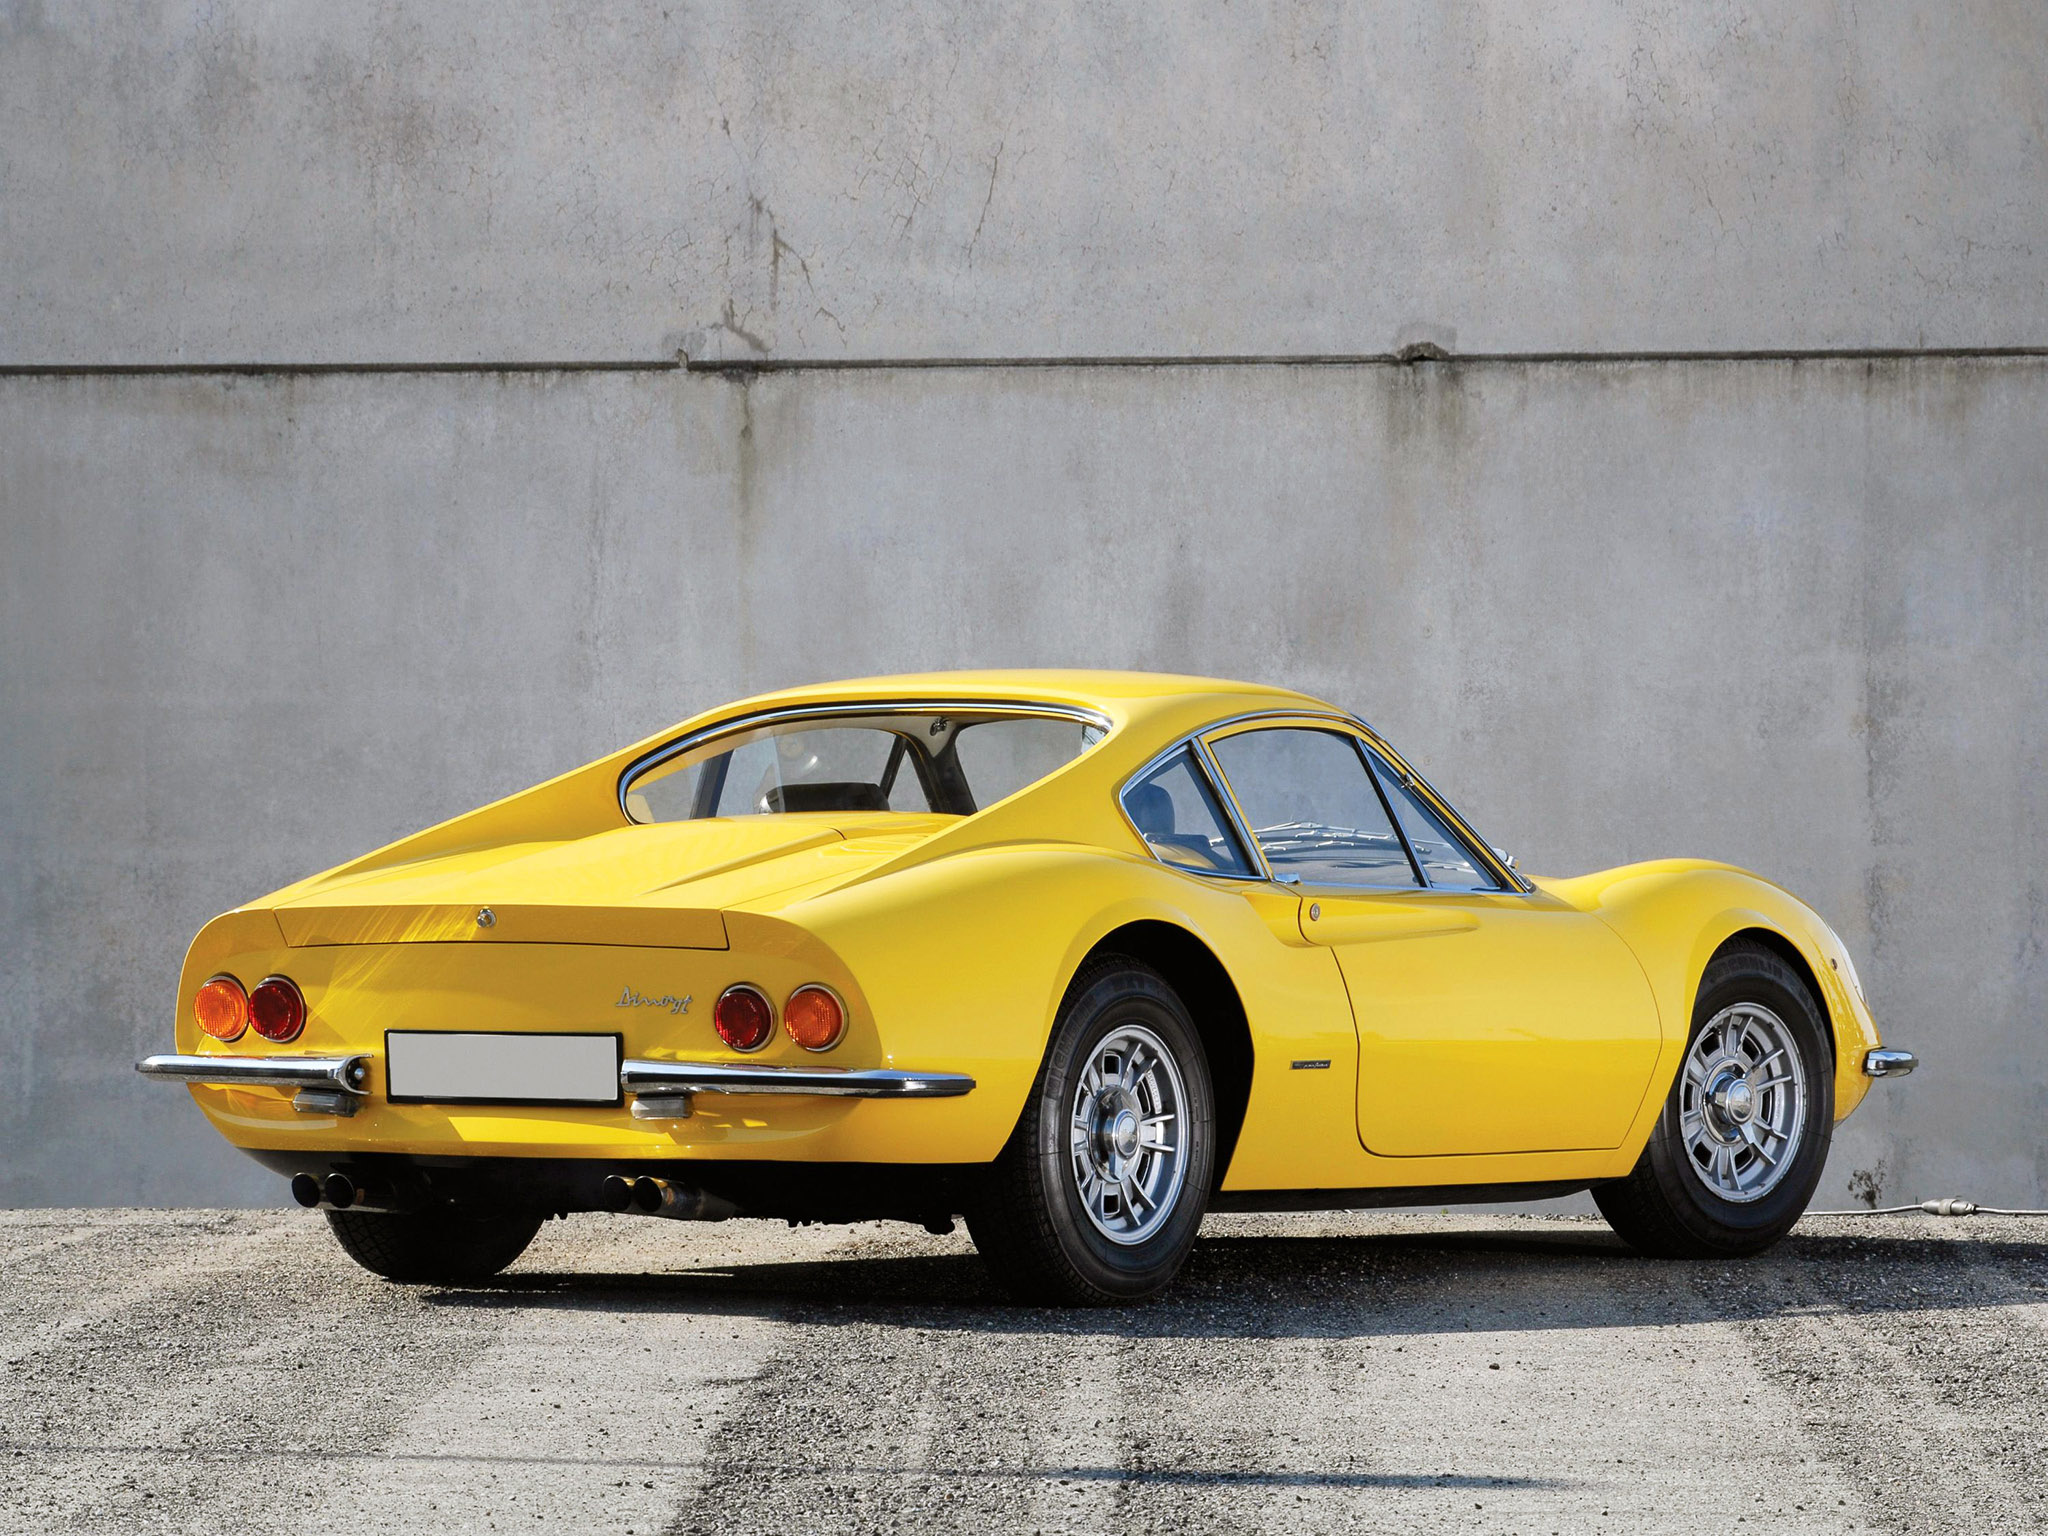 Ferrari Dino 206 GT 1968-1969 Ferrari Dino 206 GT 1968-1969 Photo 02 ...